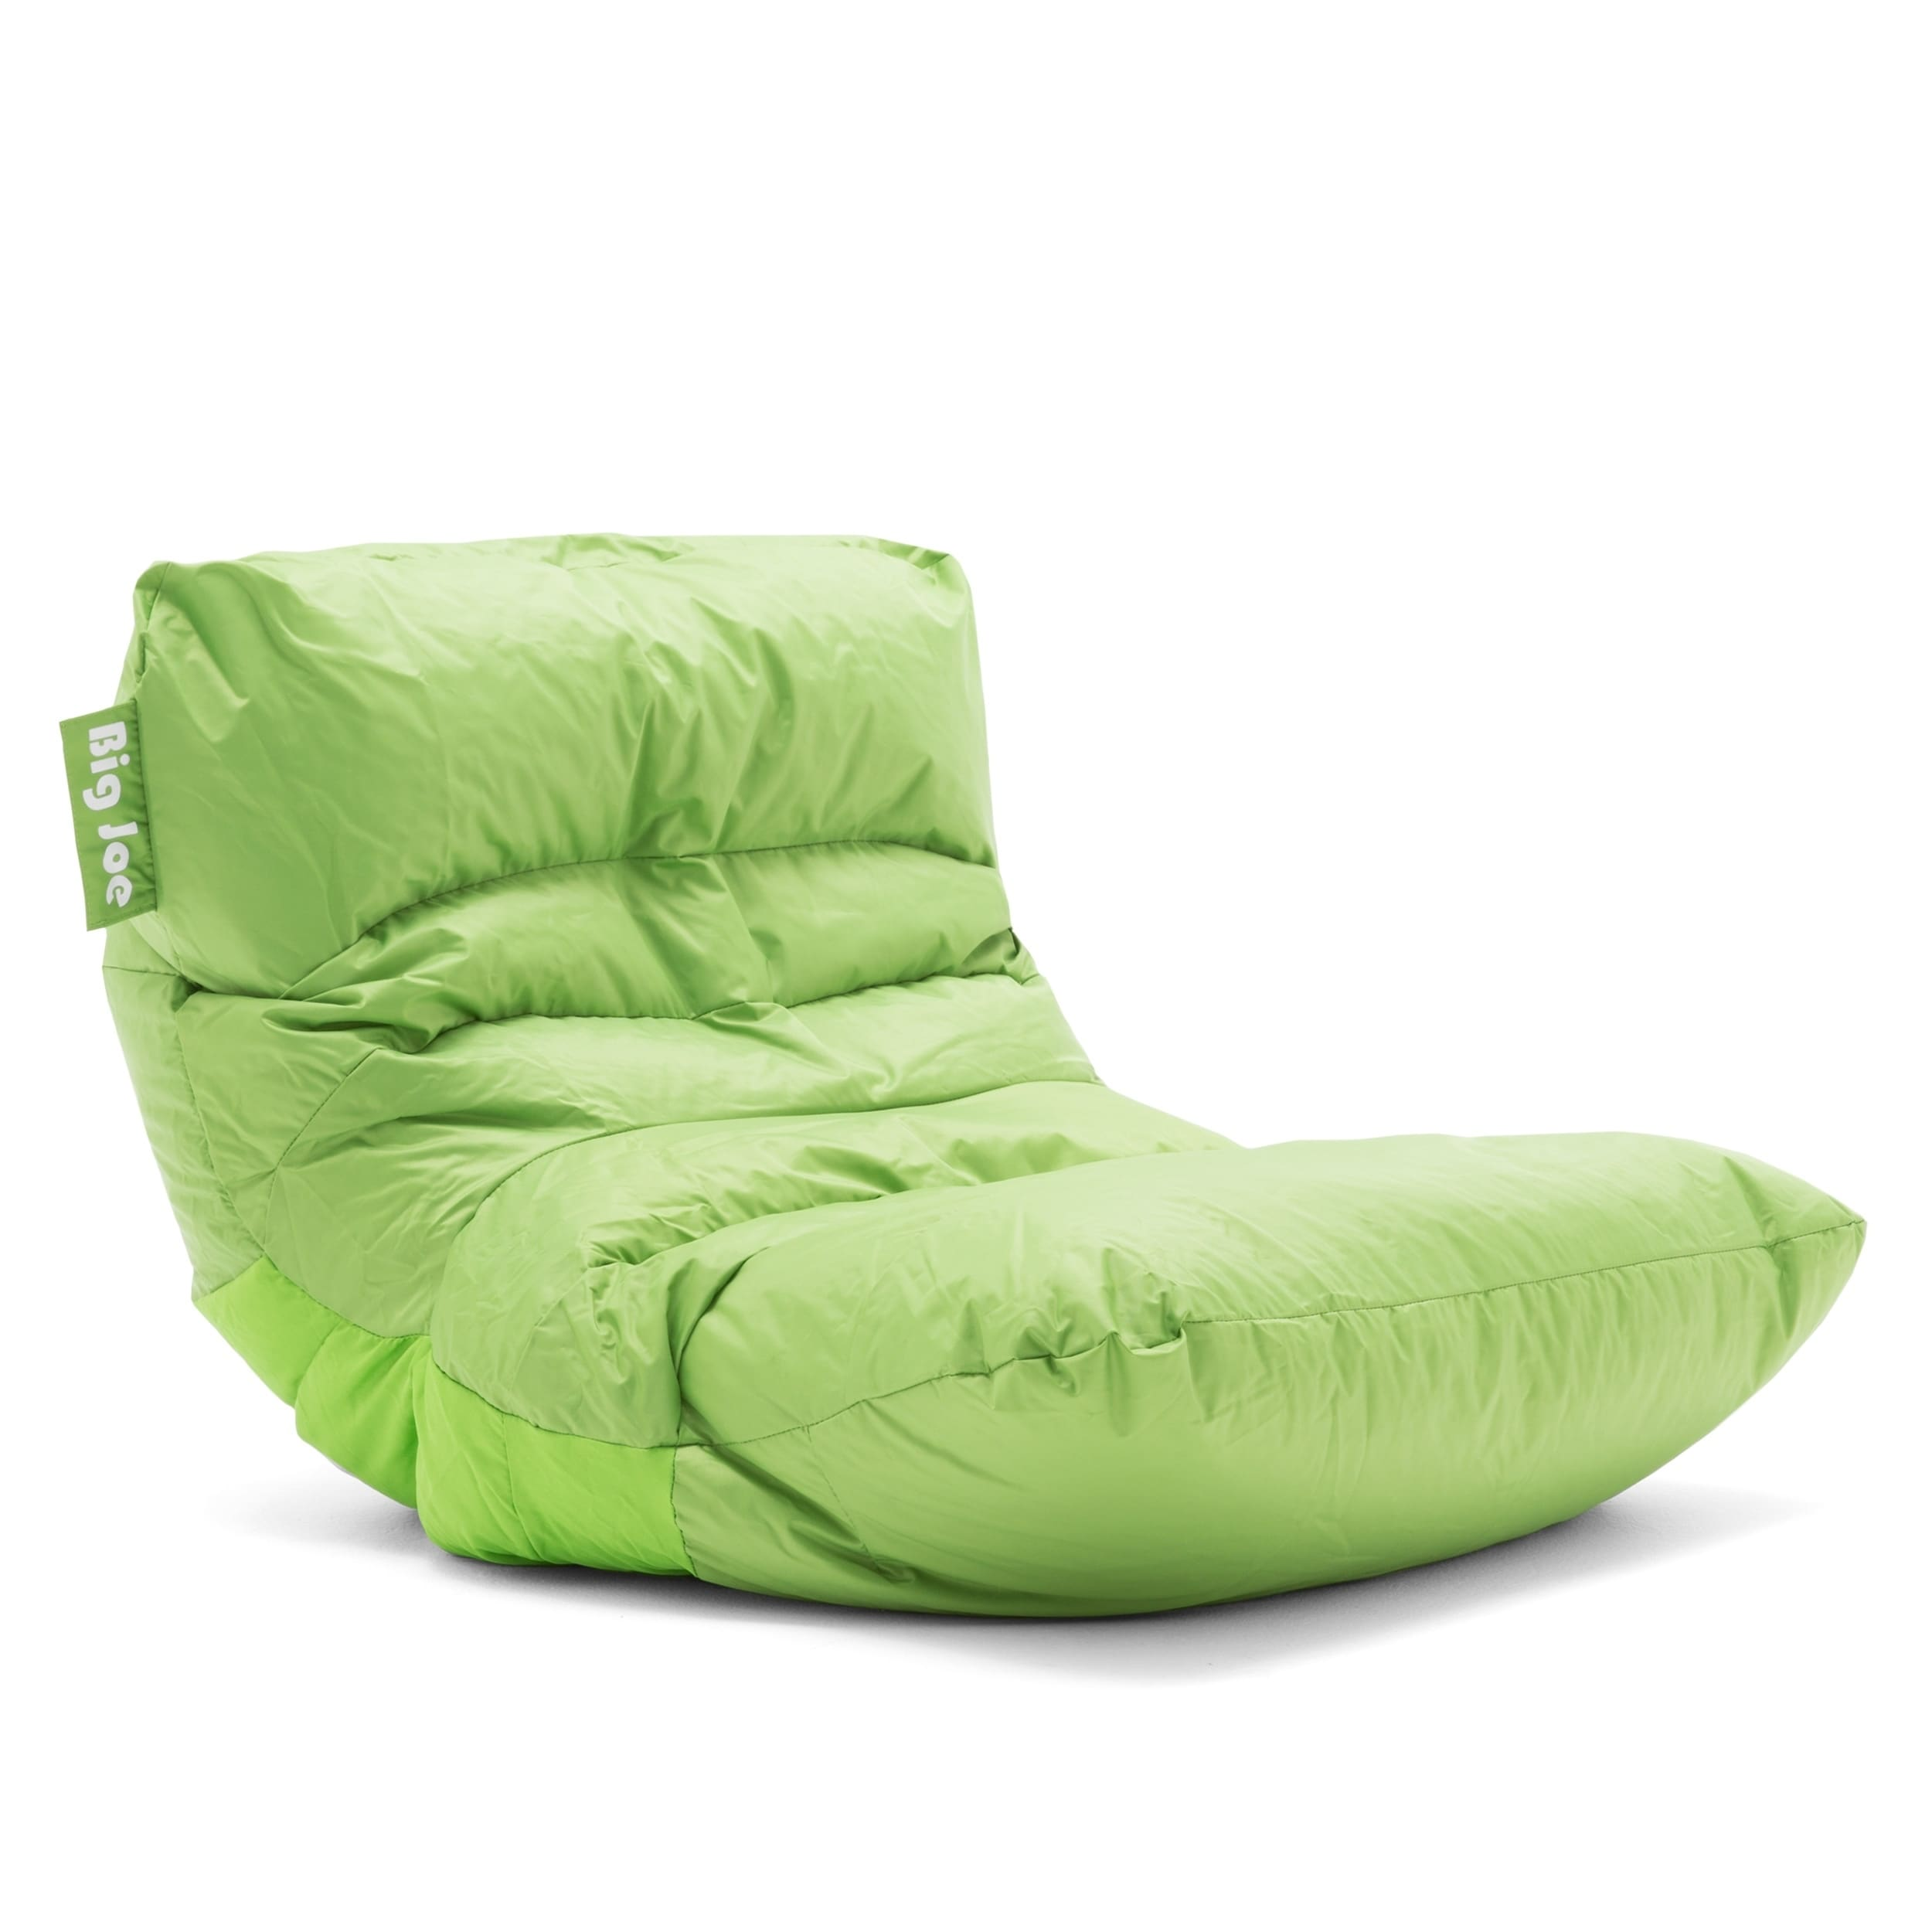 Shop Big Joe Roma Bean Bag Chair, SmartMax   Free Shipping Today    Overstock.com   16257655